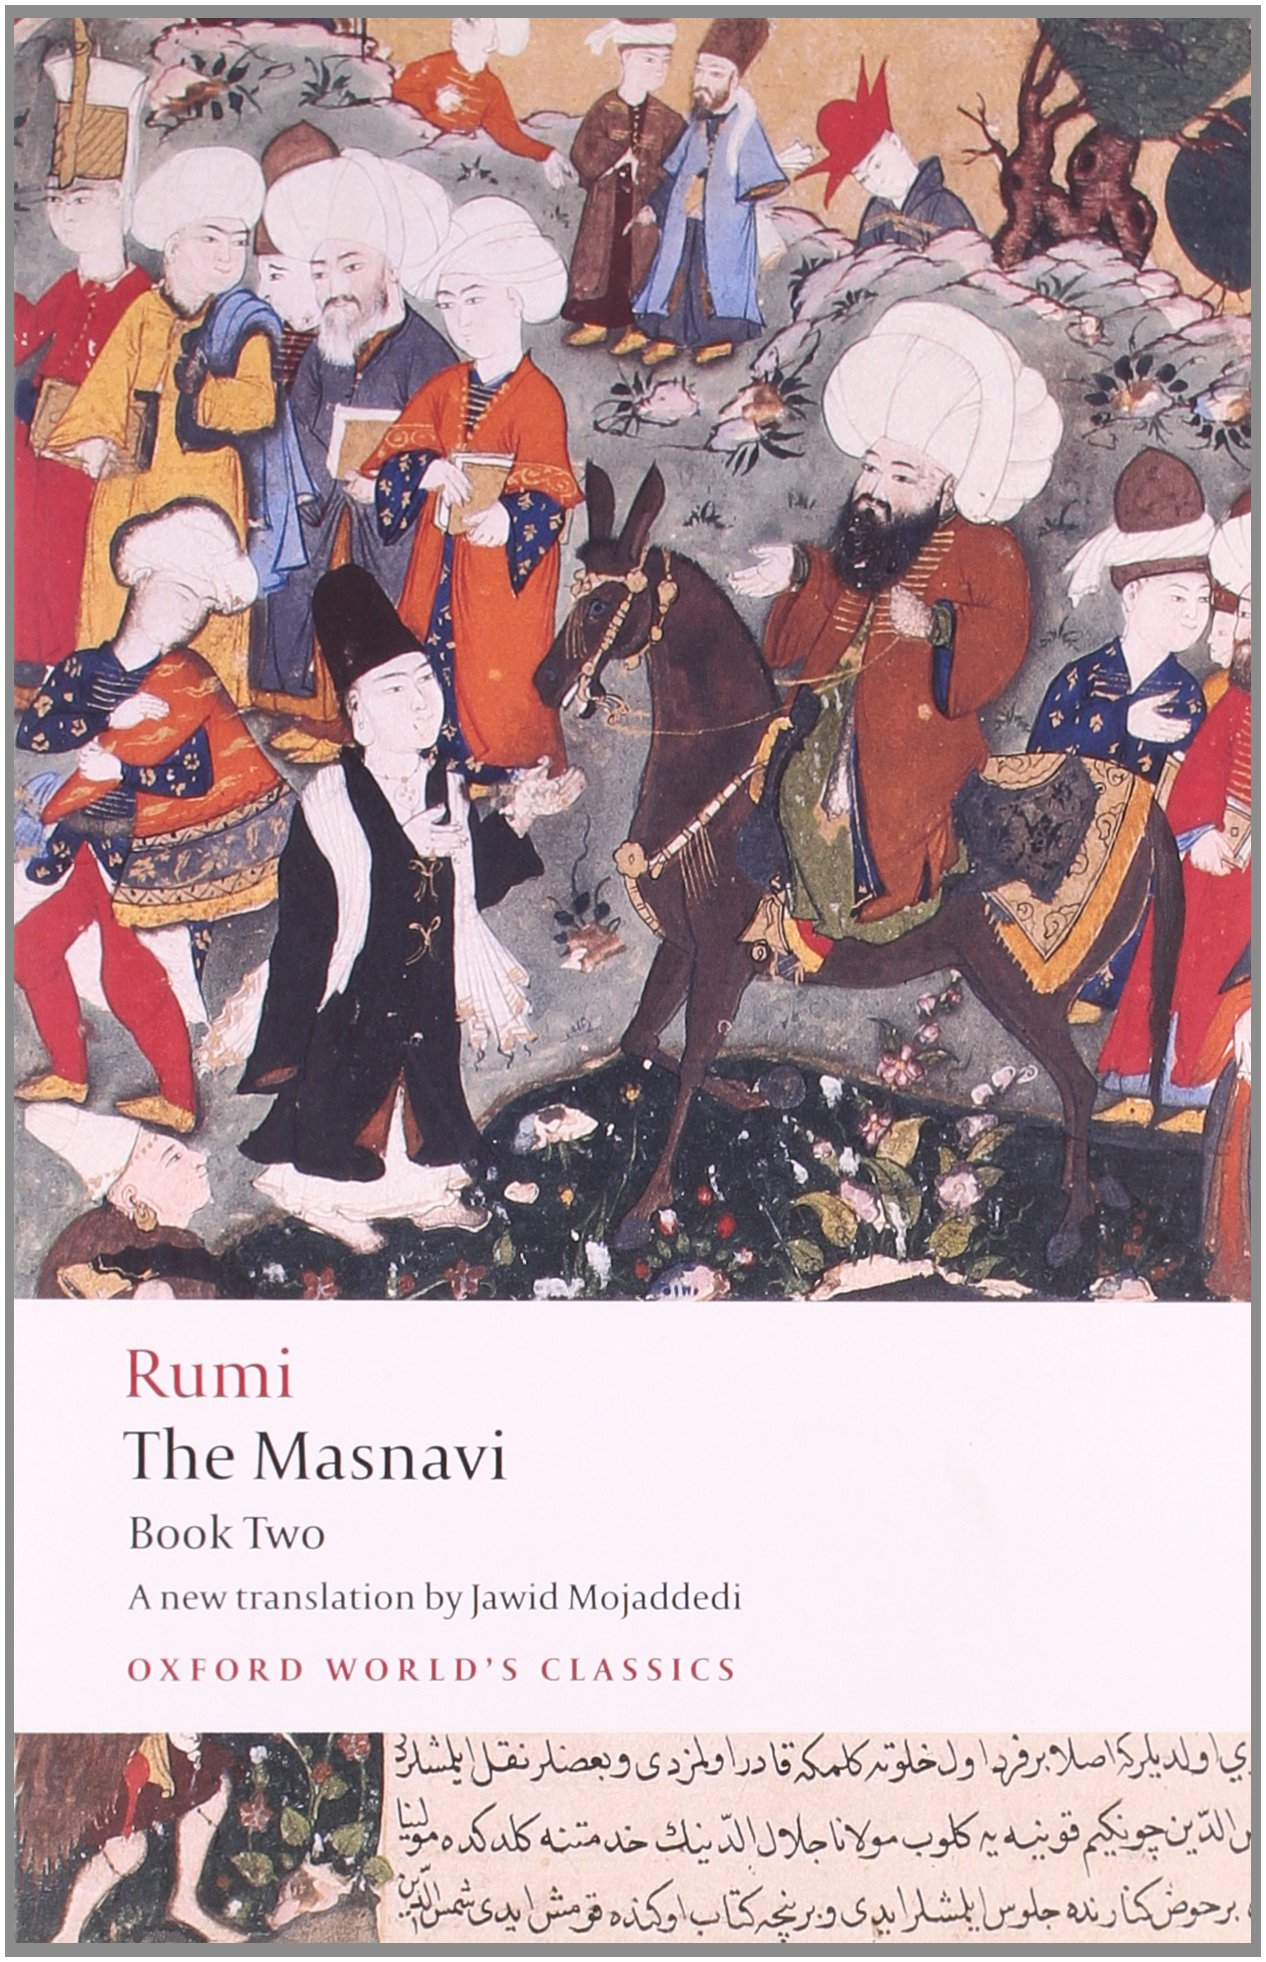 The Masnavi, Book Two (Oxford World's Classics)